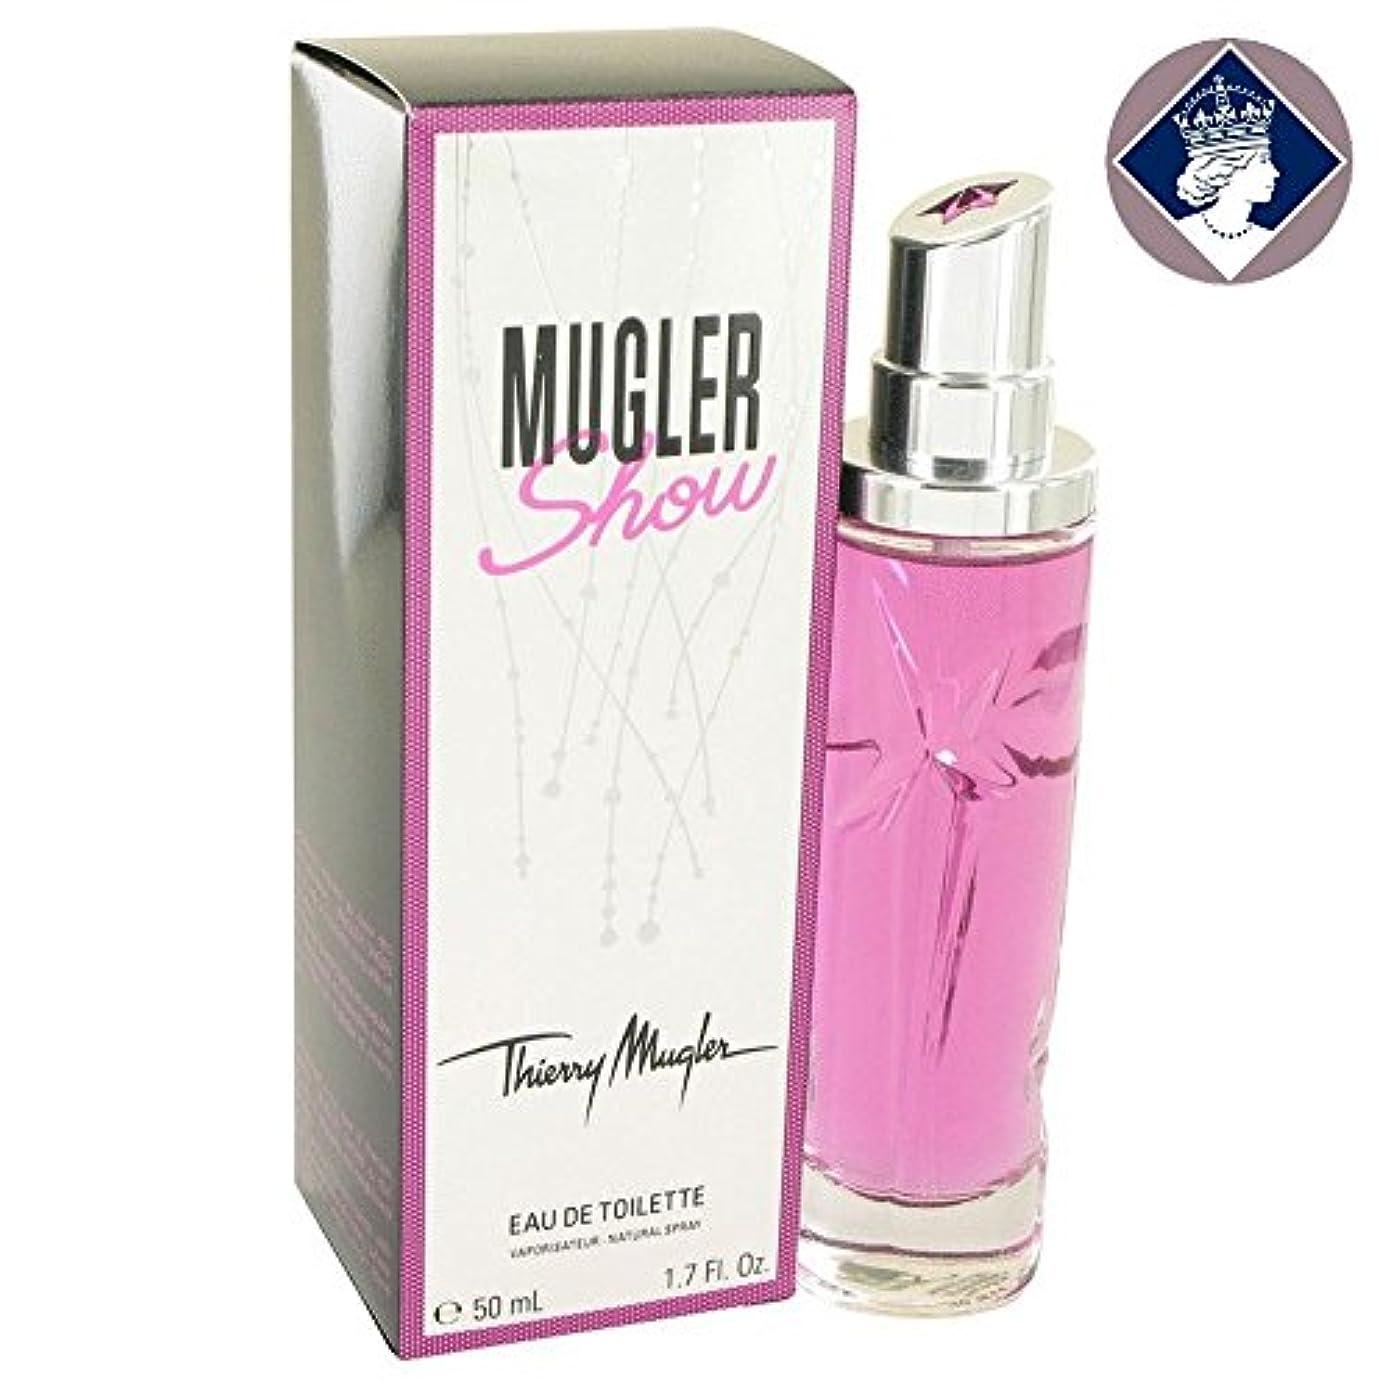 Thierry Mugler Show 50ml/1.7oz Eau De Toilette Spray Perfume Fragrance for Women